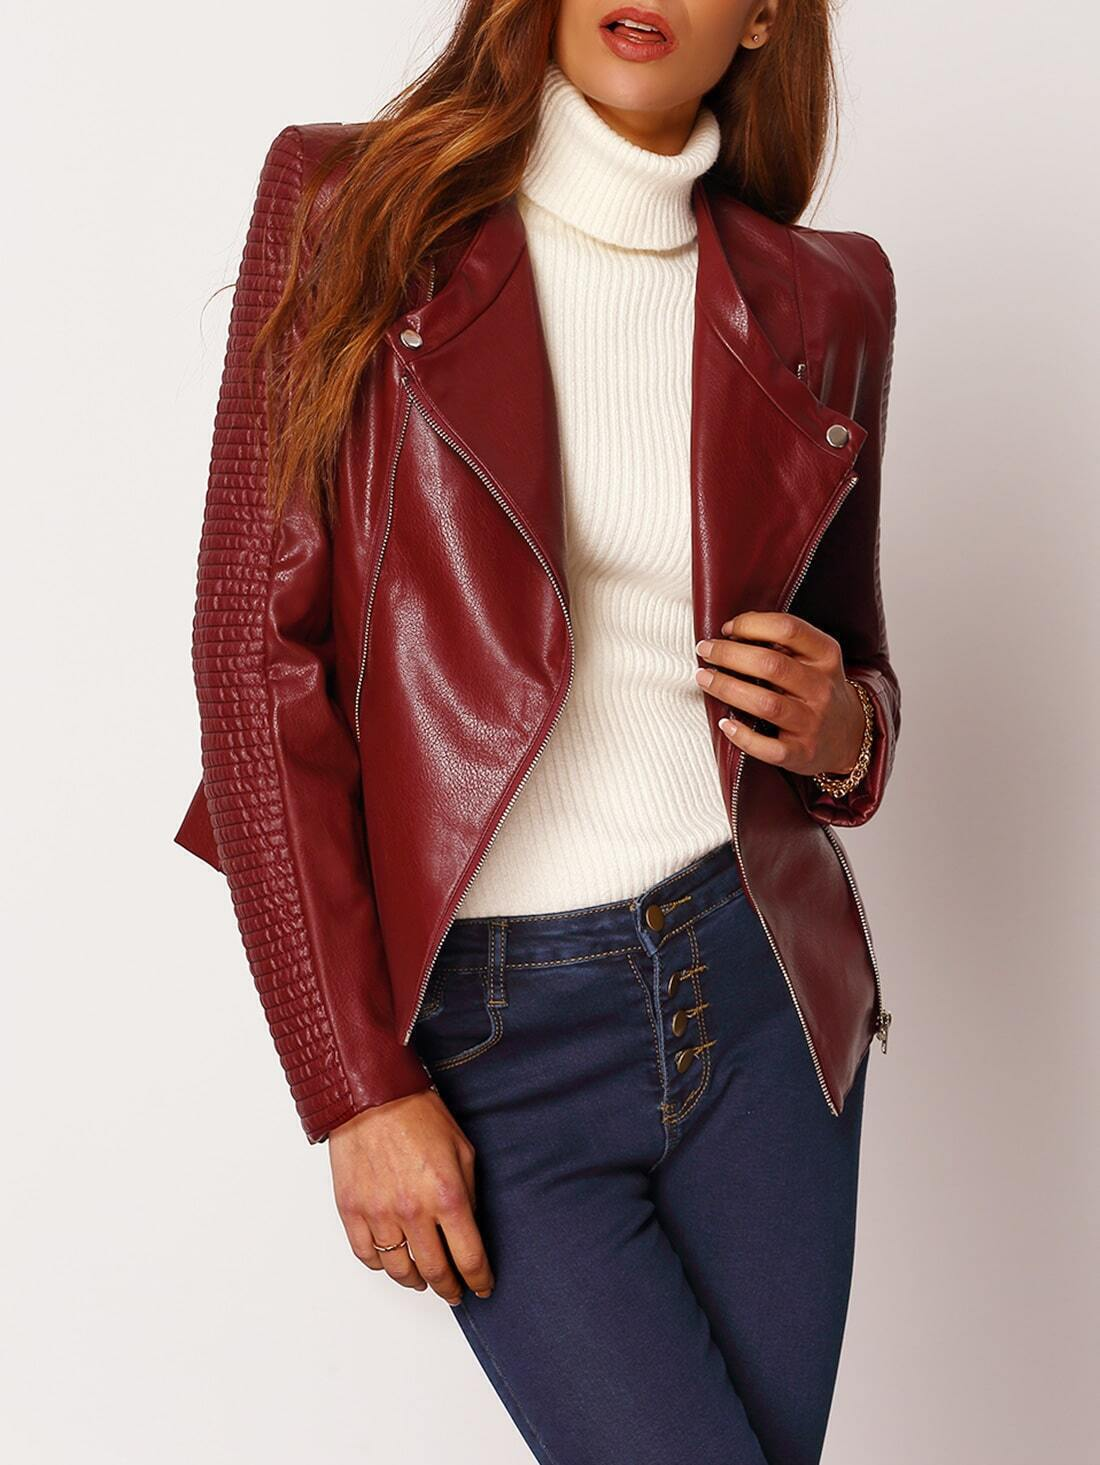 Burgundy Long Sleeve Zipper PU Leather Jacket